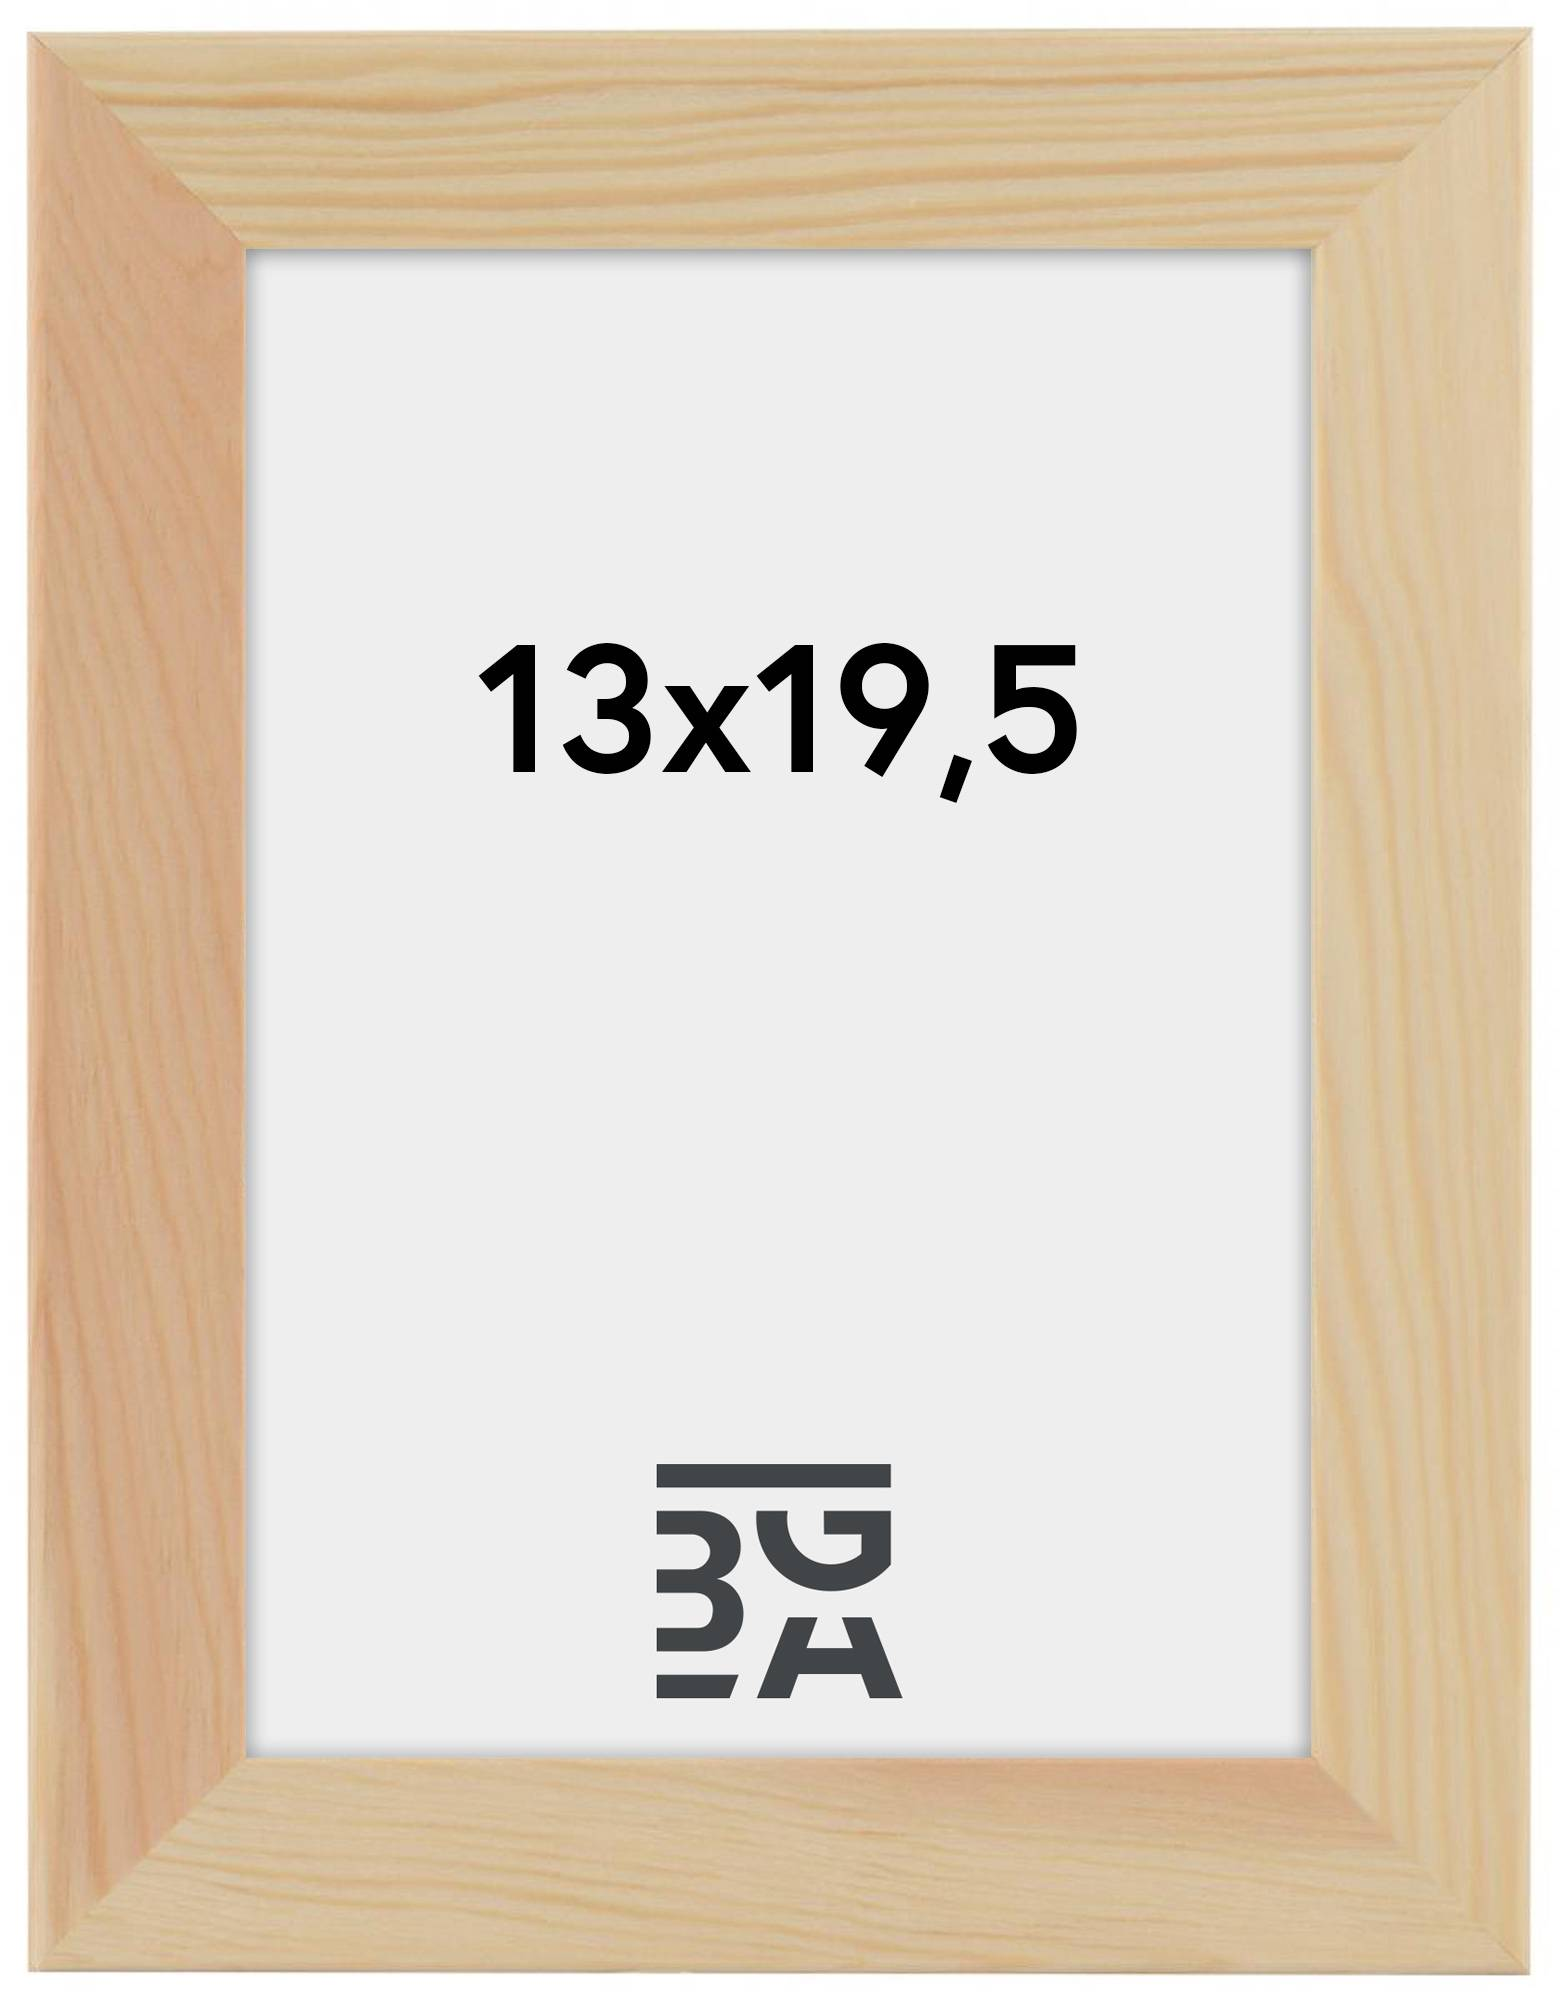 Image of Artlink - Special Trendline Nature 13x19,5 cm